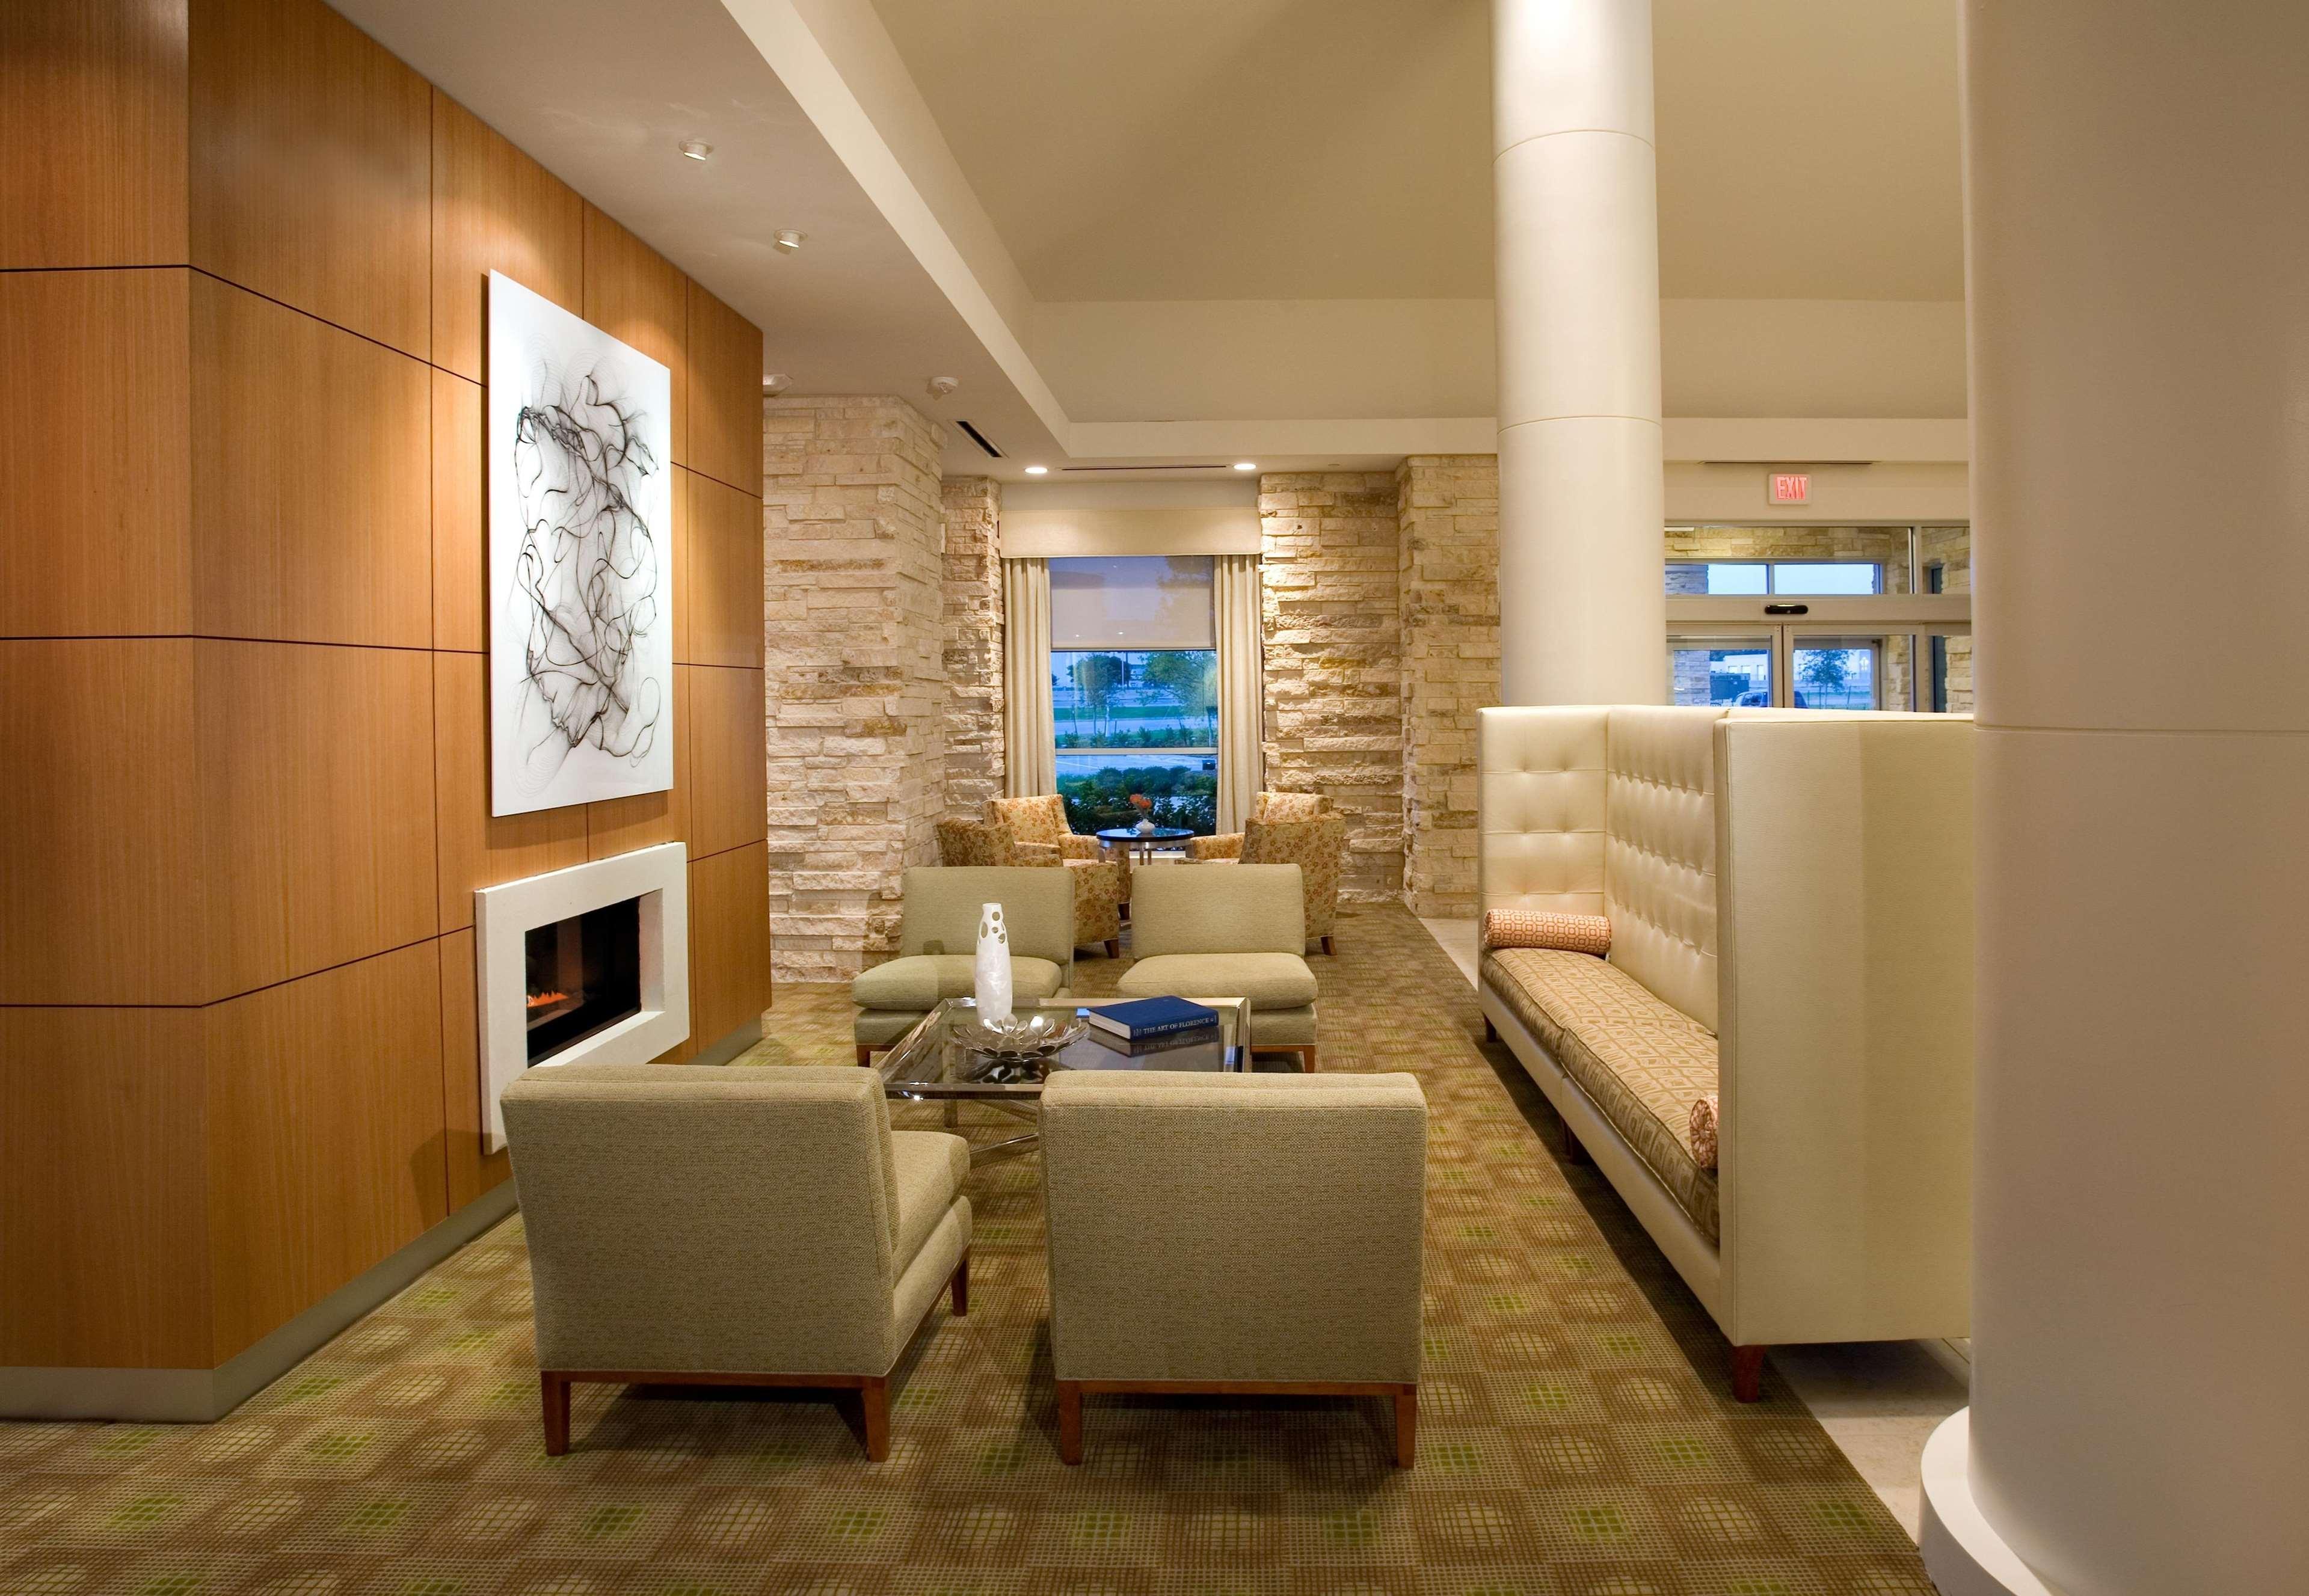 Hilton Garden Inn Dallas/Richardson 1001 W President George Bush Hwy ...